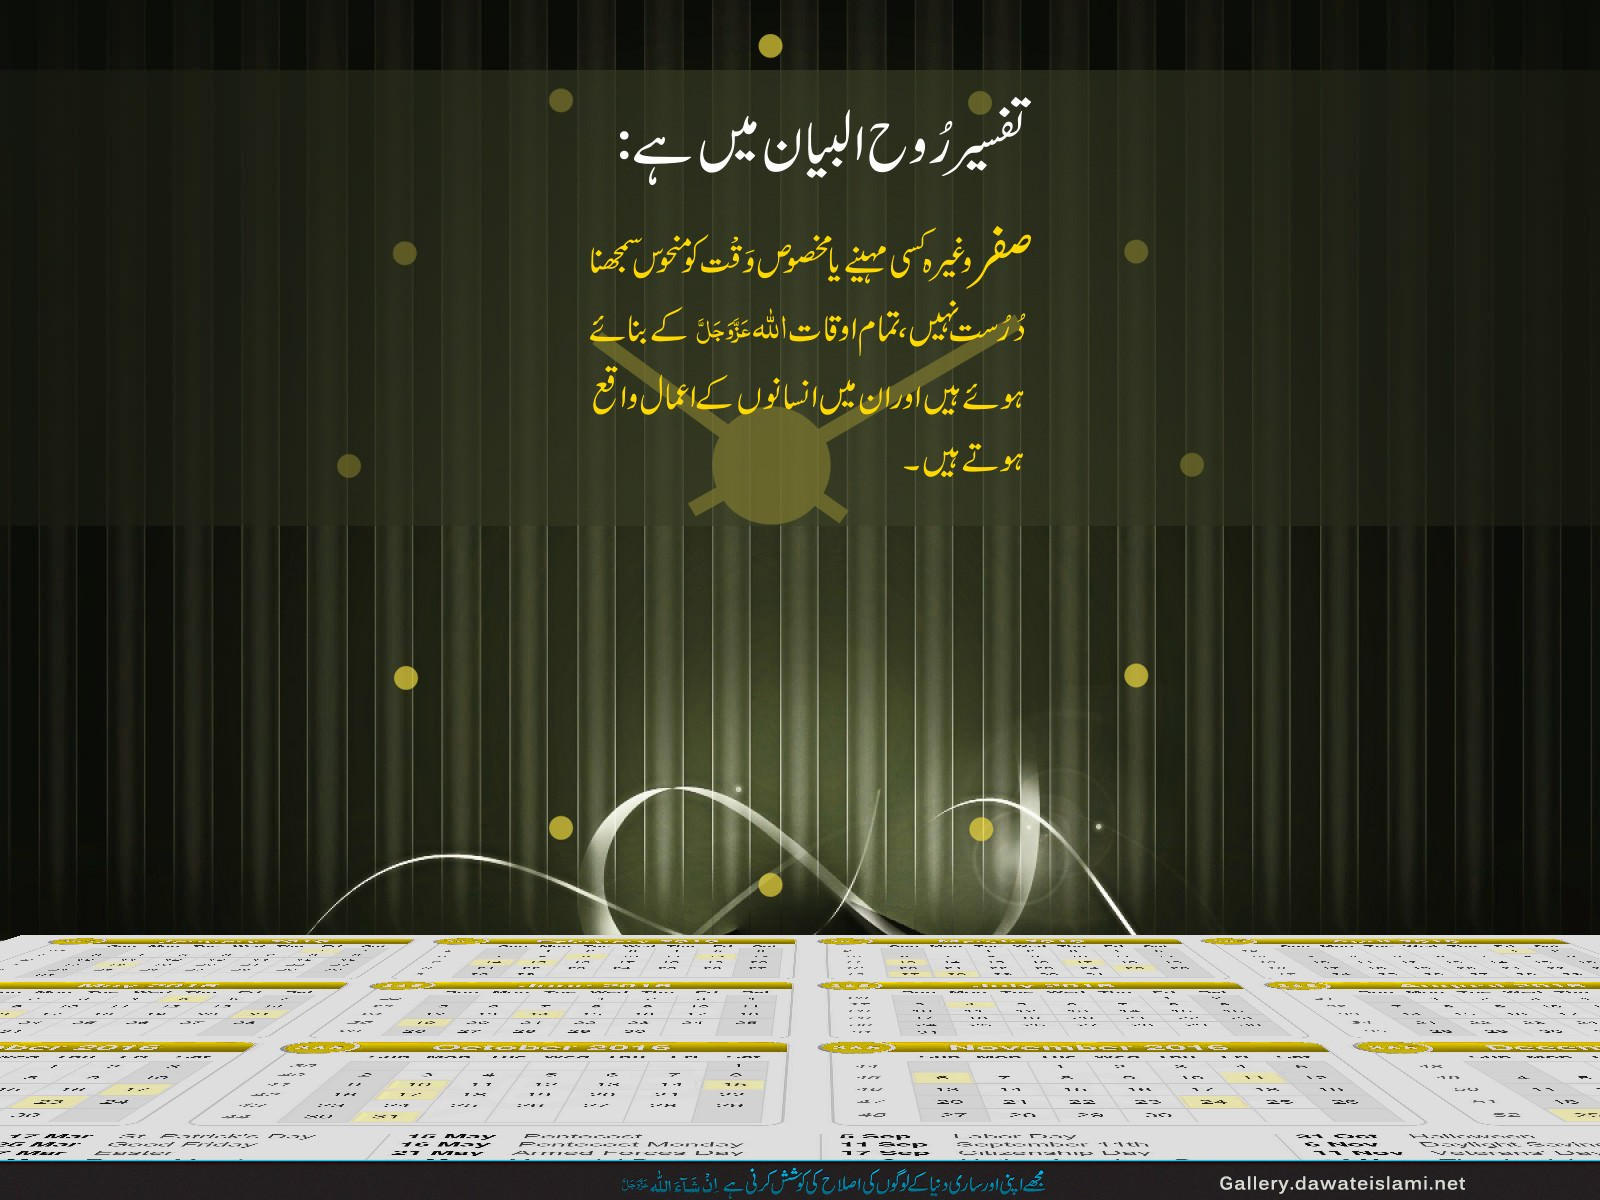 S Name Ka Wallpaper: Zohod Teen Chezon Ka Name Hai- Safar Wallpaper